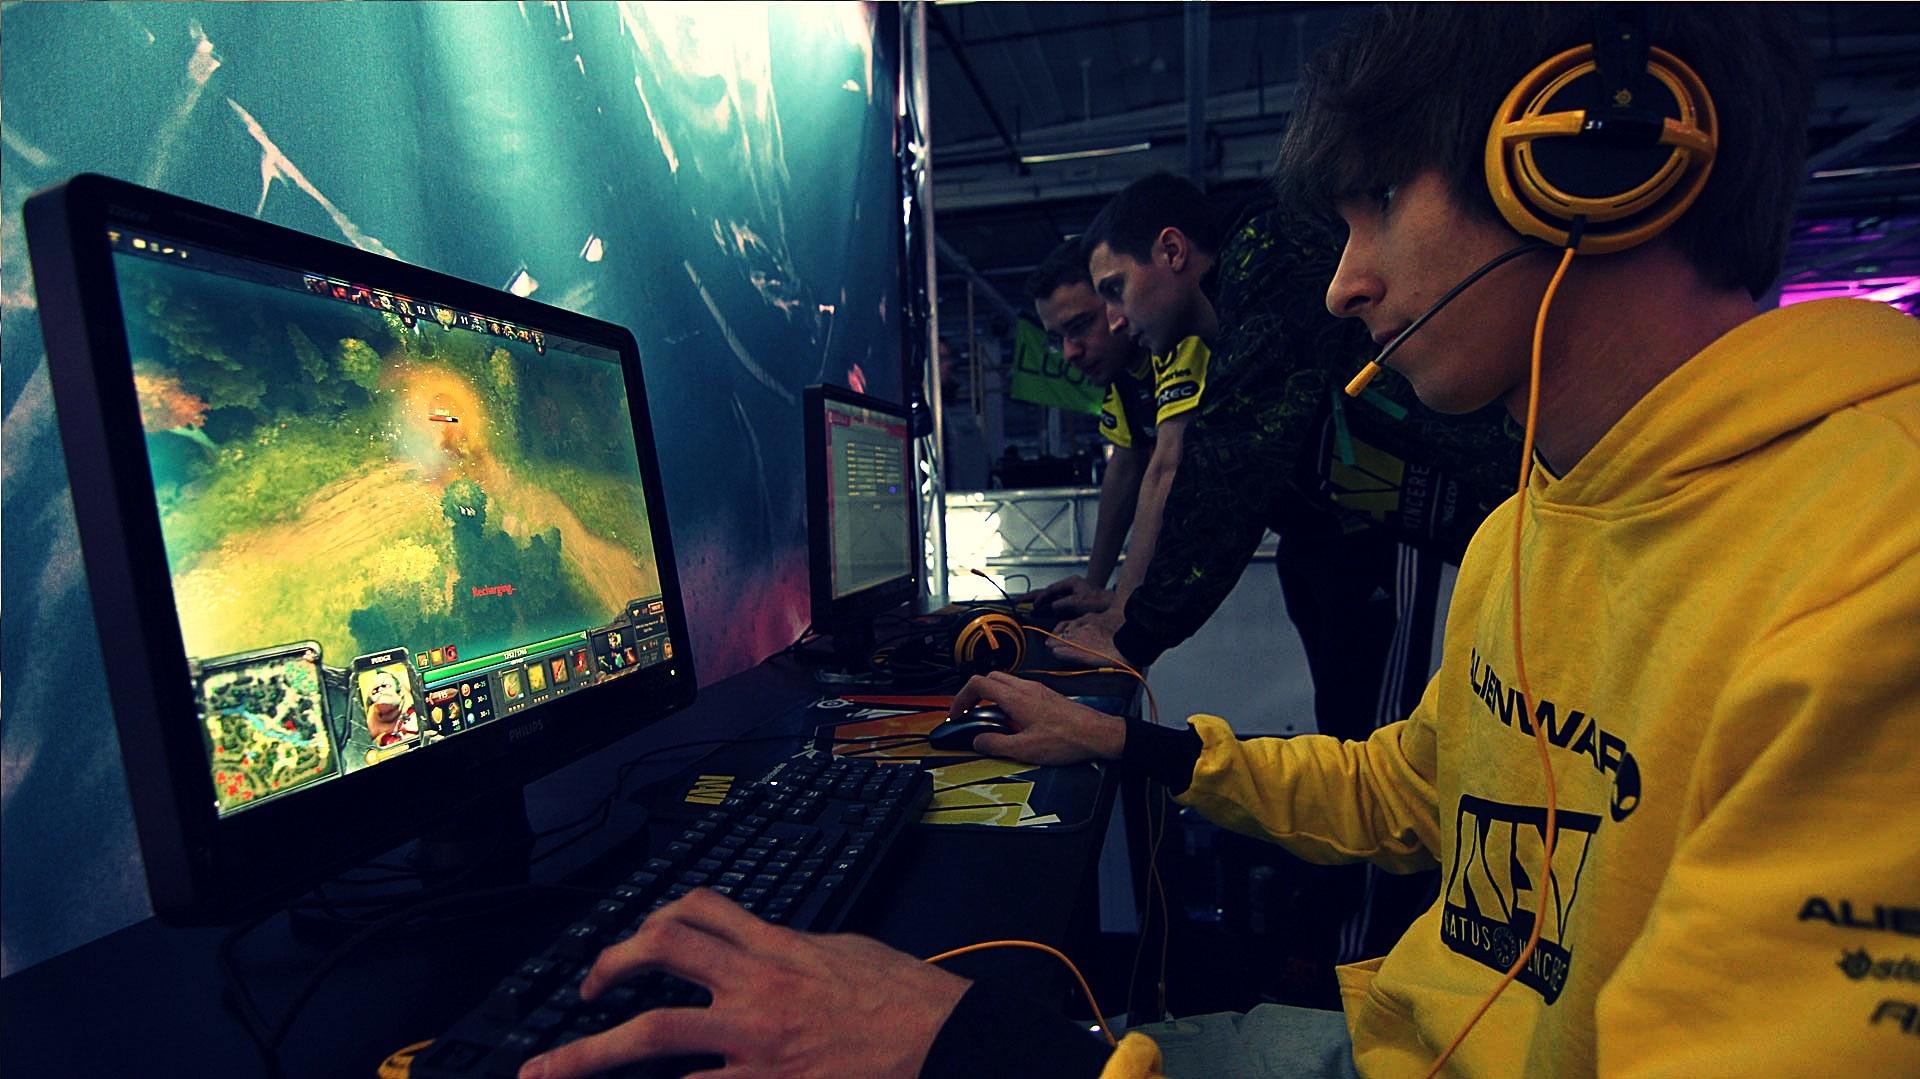 Ukrainian becomes world's top online gamer   KyivPost